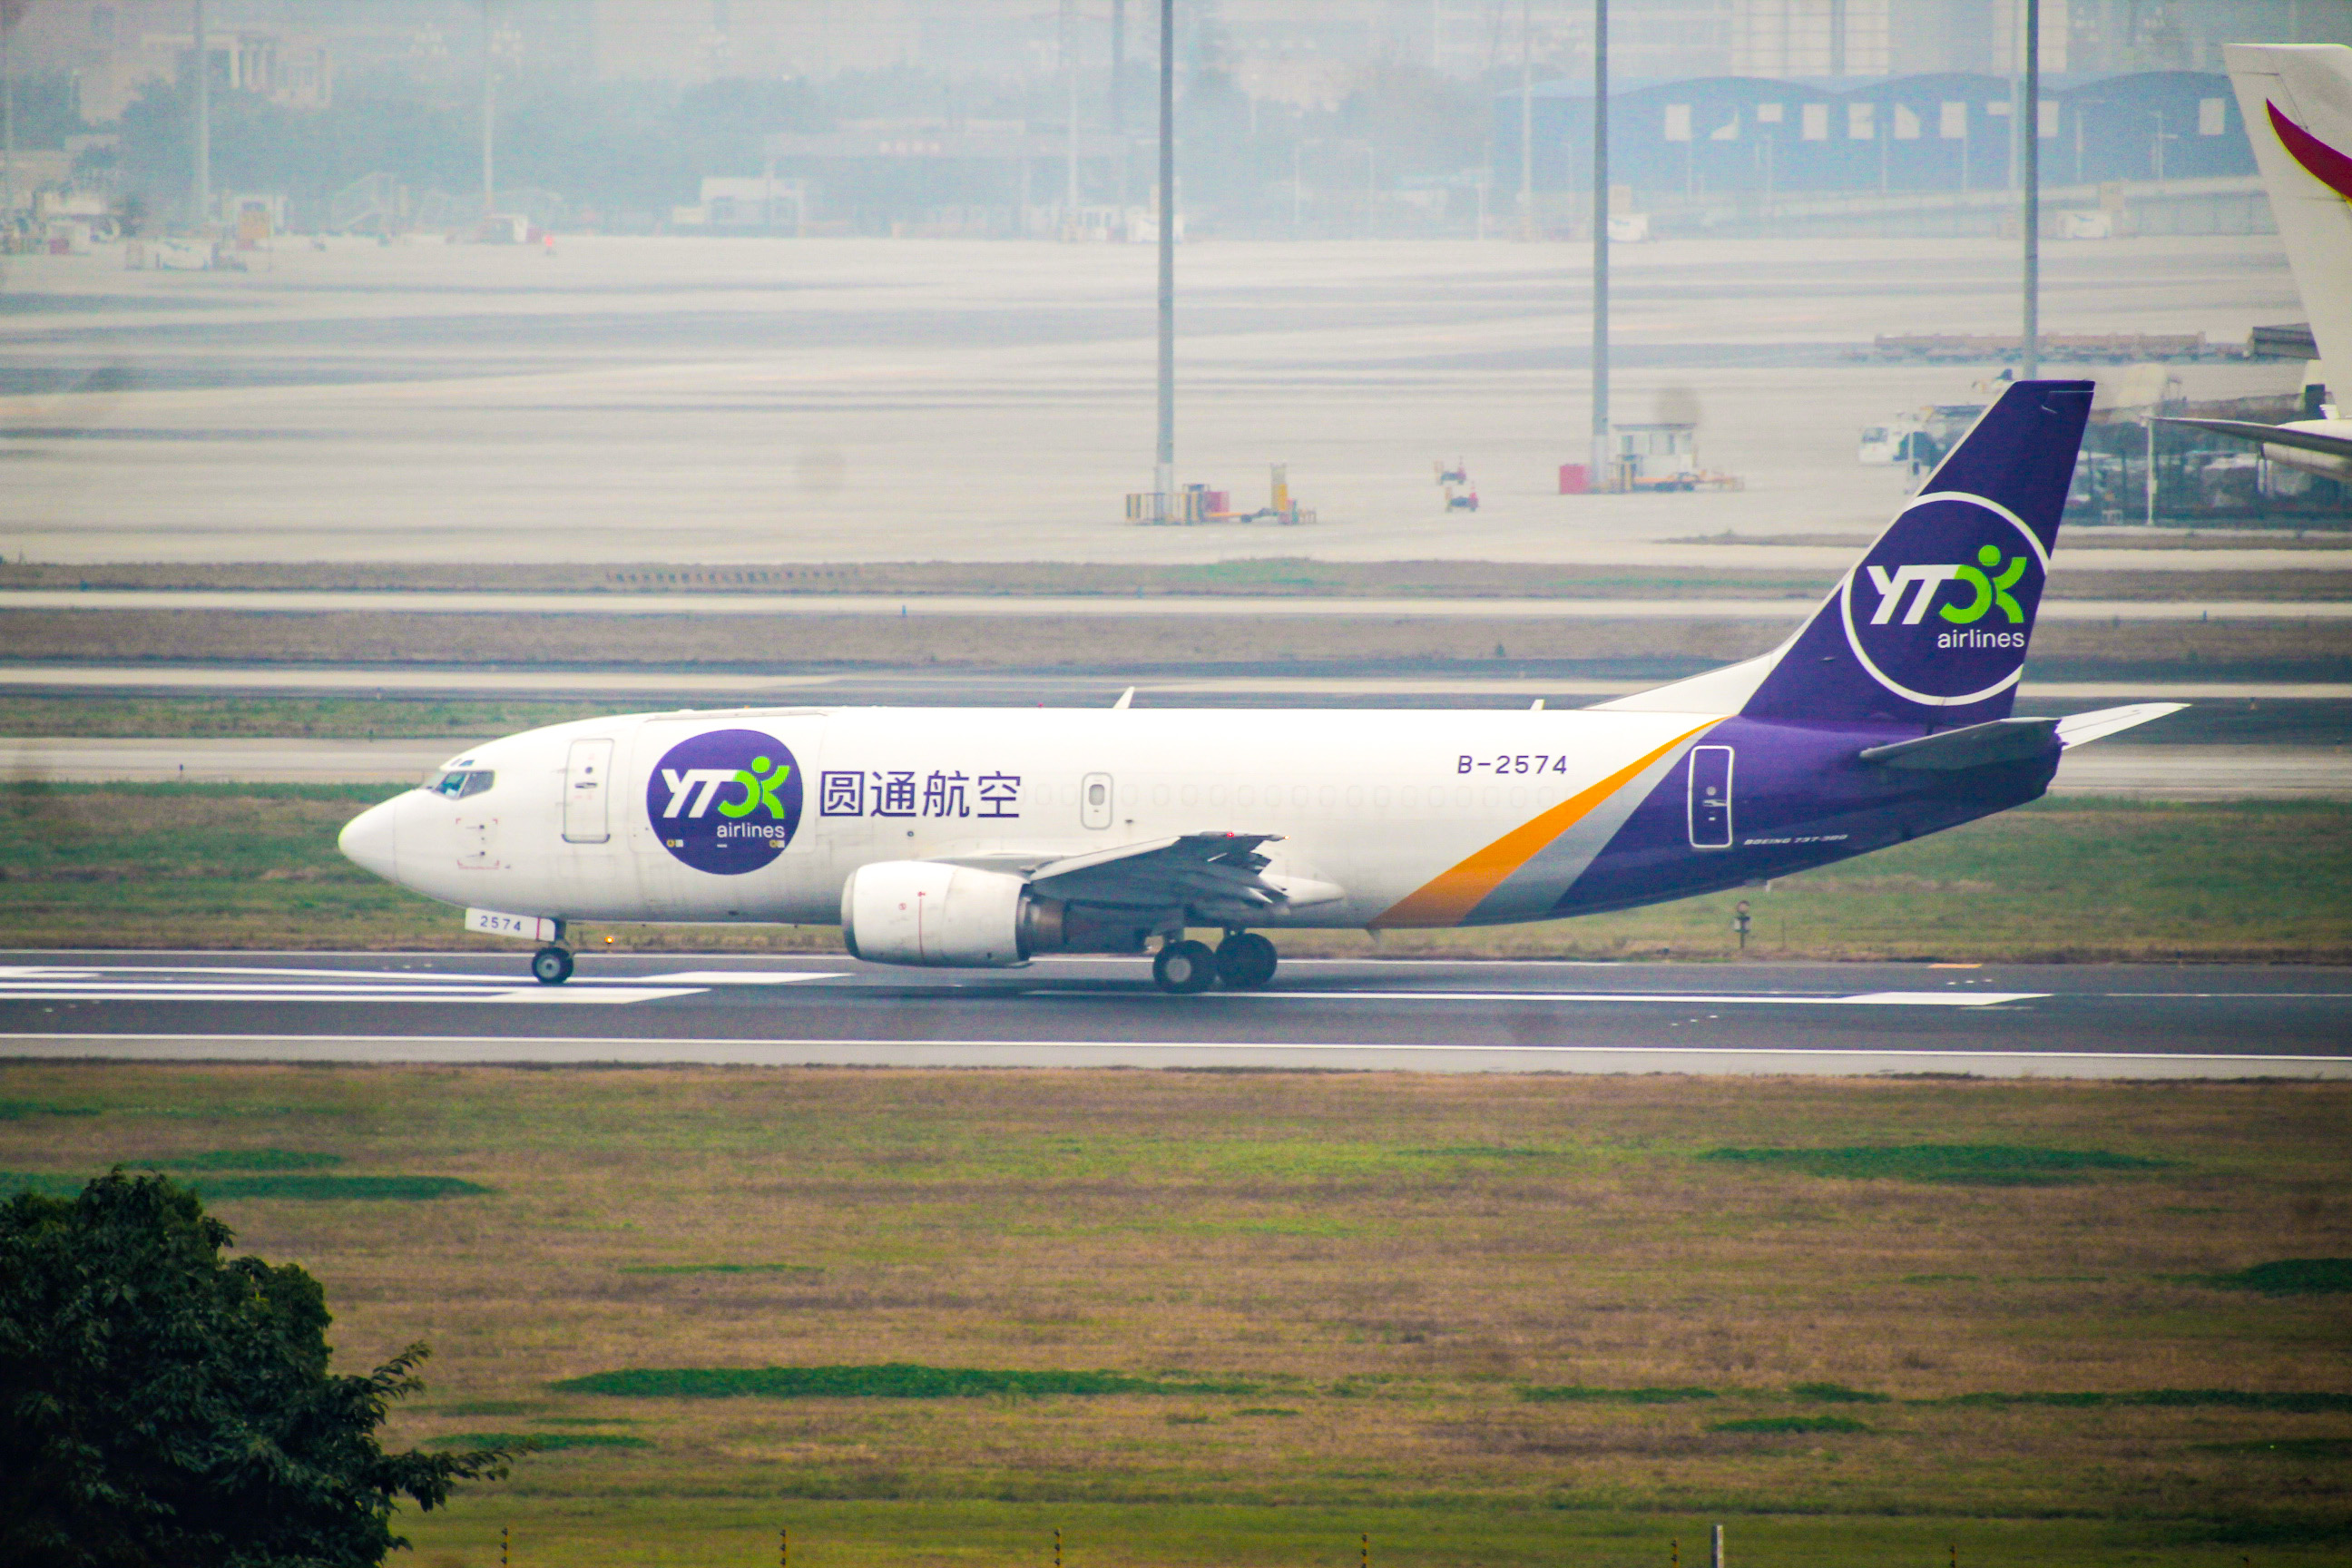 Re:[原创]CTU水泥天拍机,验证烂天好货的铁律 BOEING 737-300 B-2574 中国成都双流国际机场